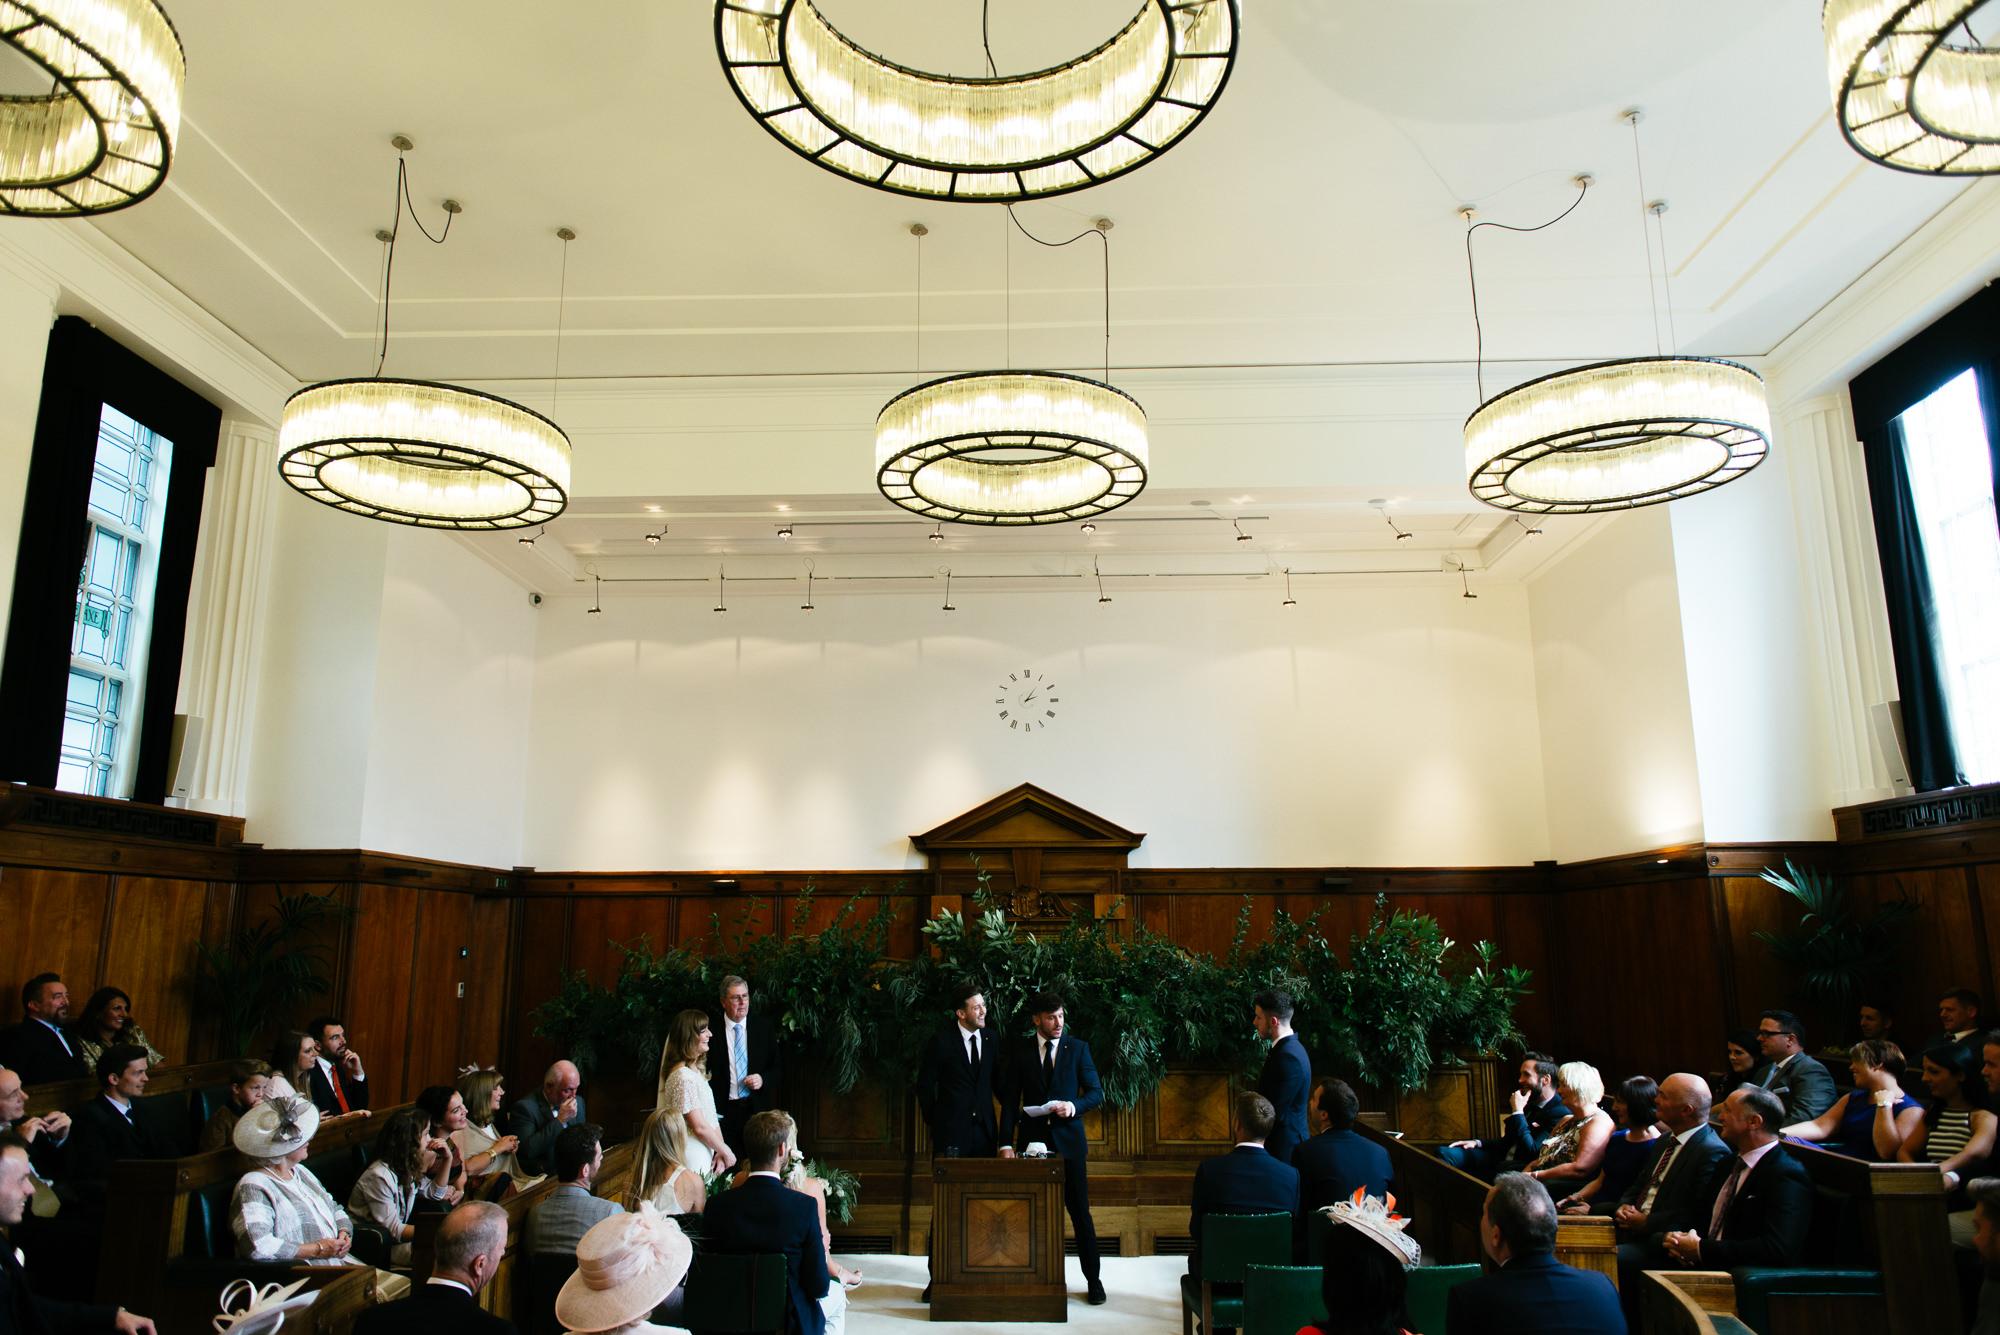 town-hall-hotel-london-wedding-32